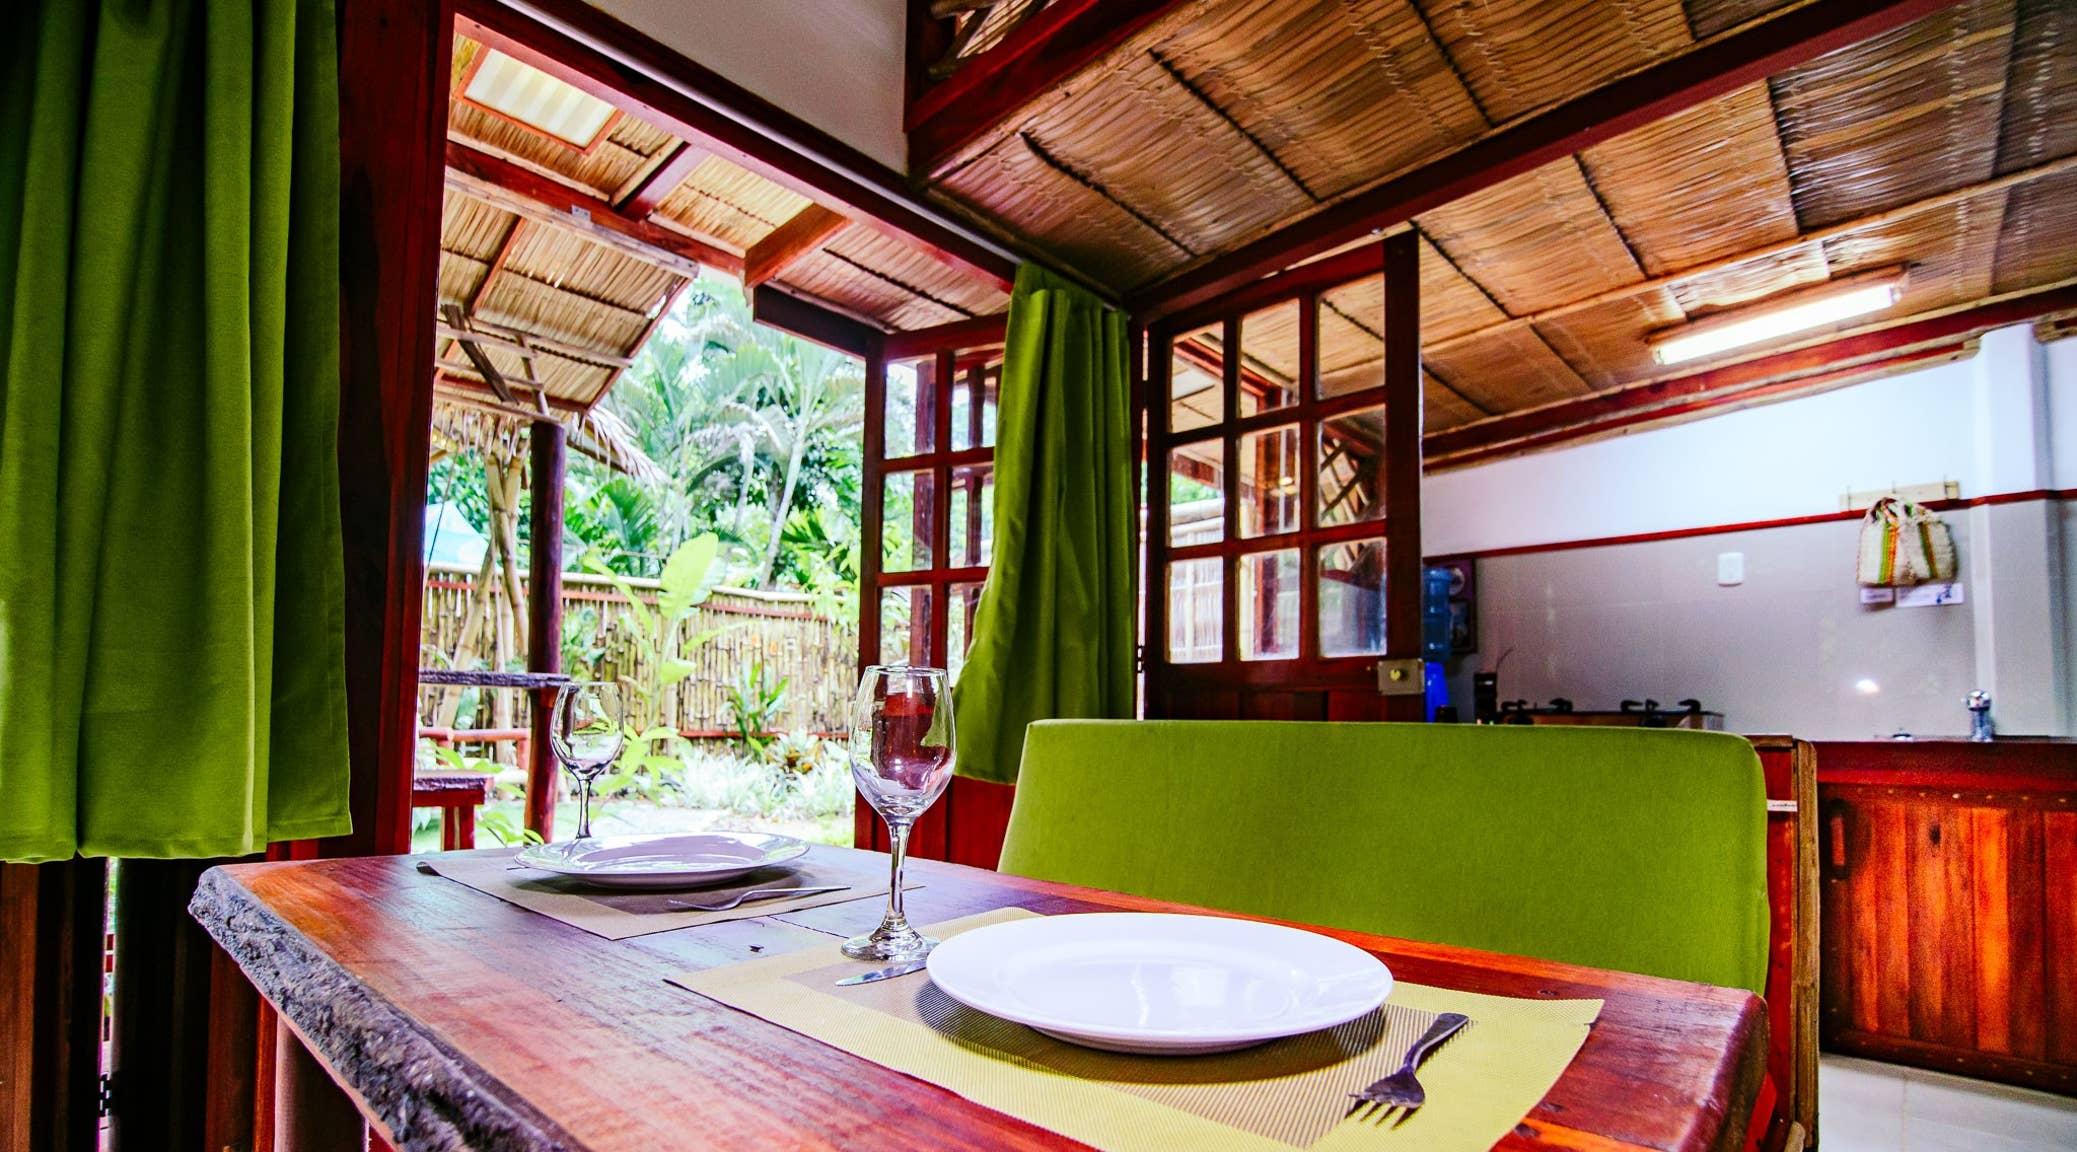 Villa 6 - Luxury 2 Bed Villa - Private Garden